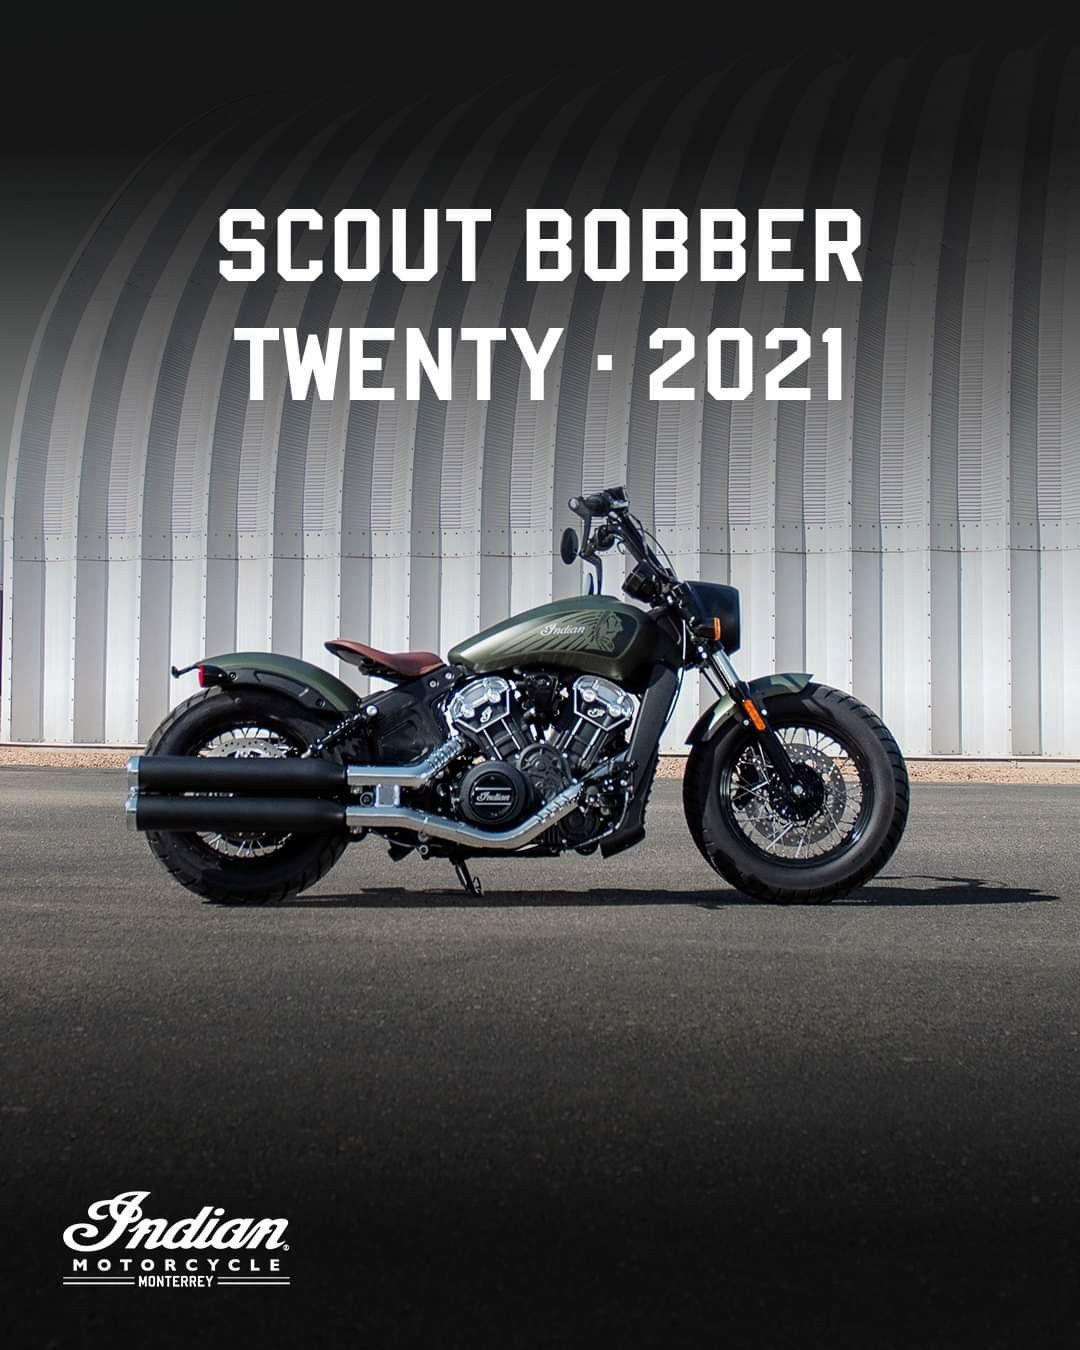 Pin By Lola Ruiz On Autos Motos Bobber Scout Motorcycle [ 1350 x 1080 Pixel ]